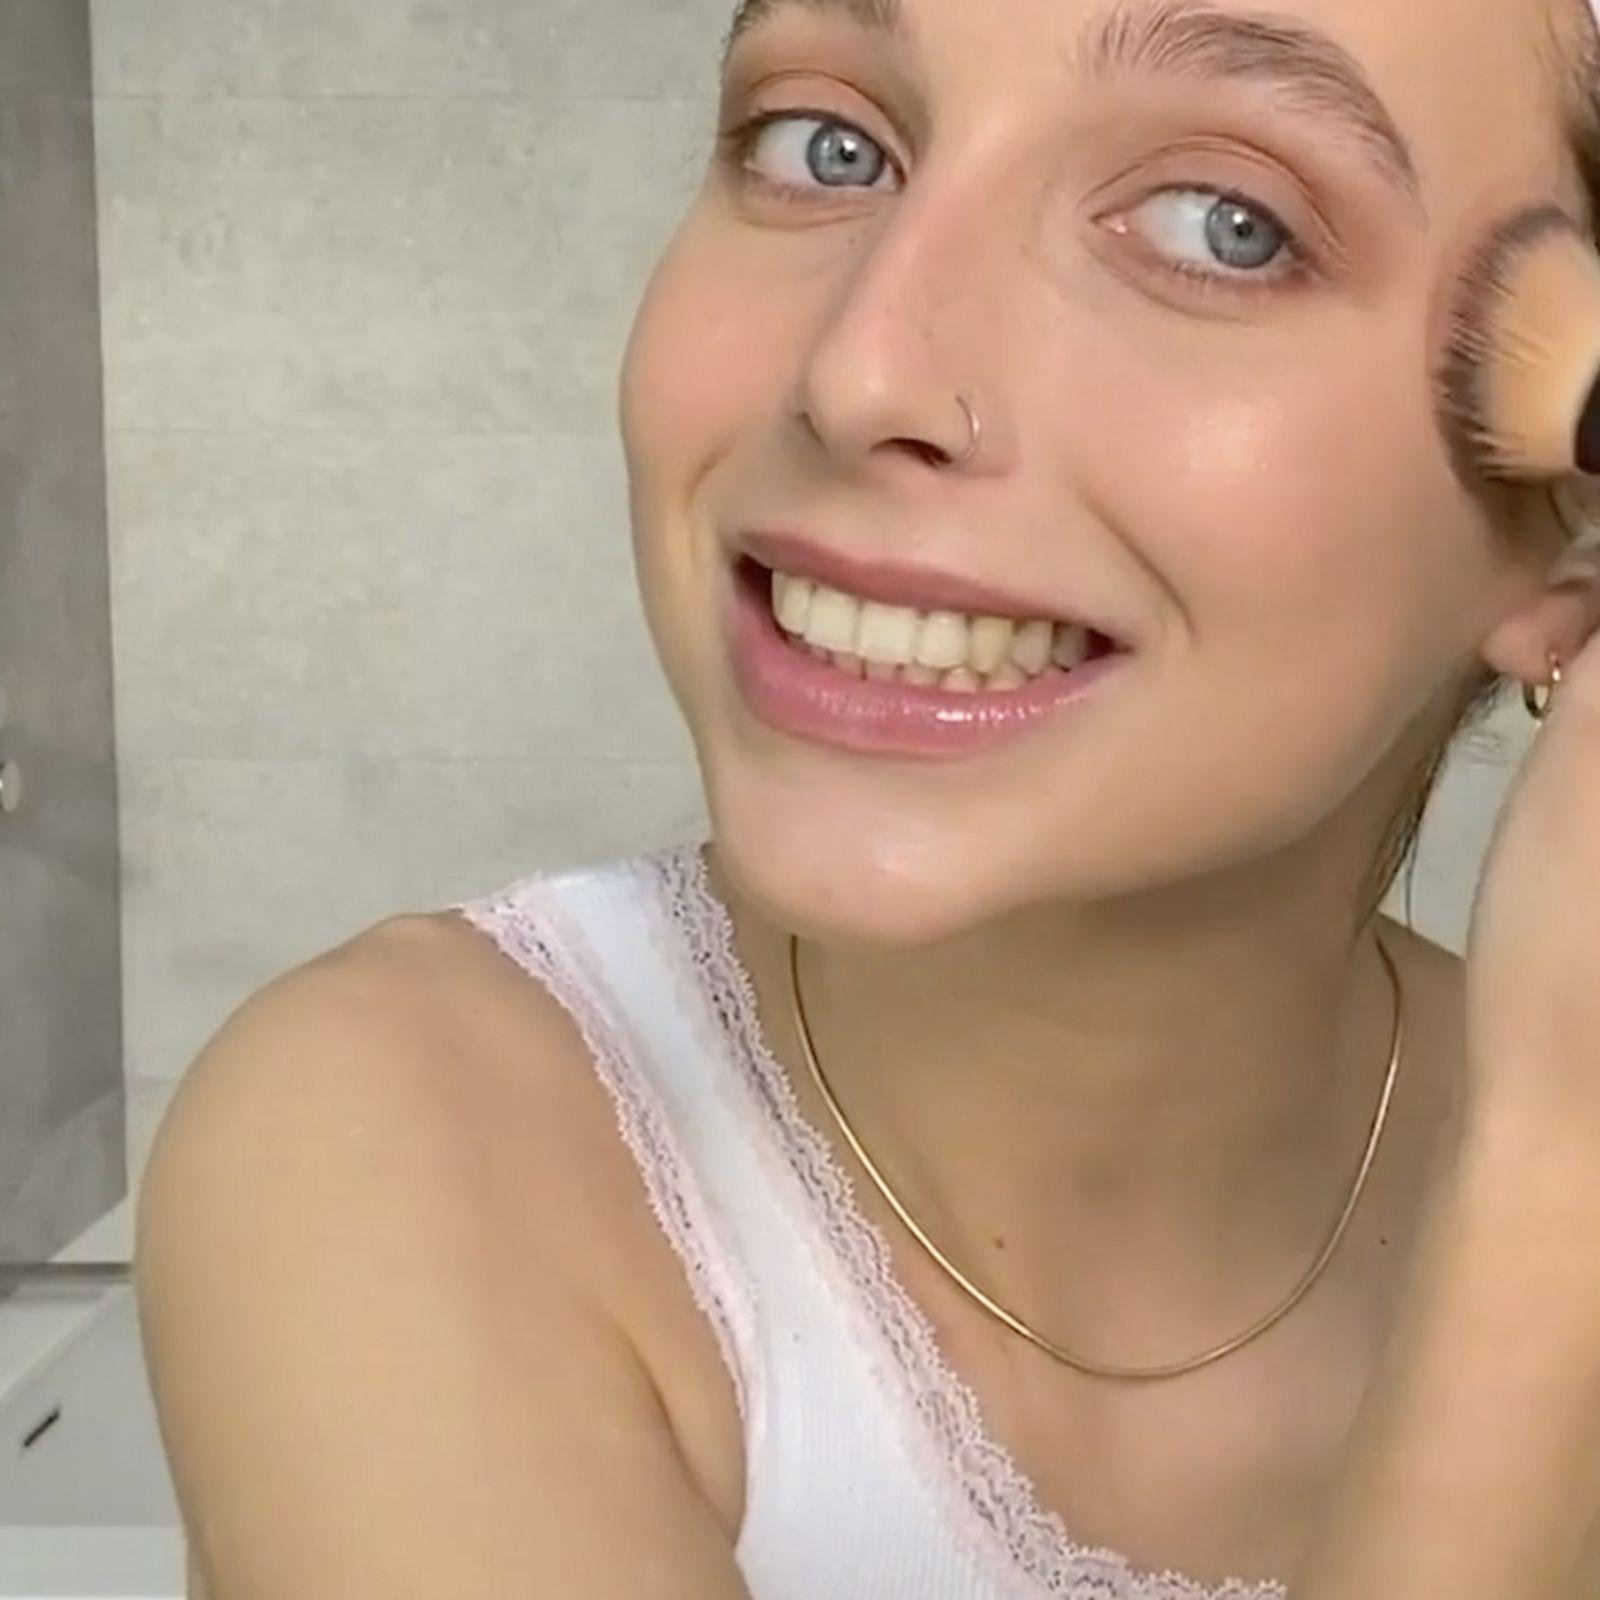 Un maquillaje a prueba de acné por Emma Chamberlain